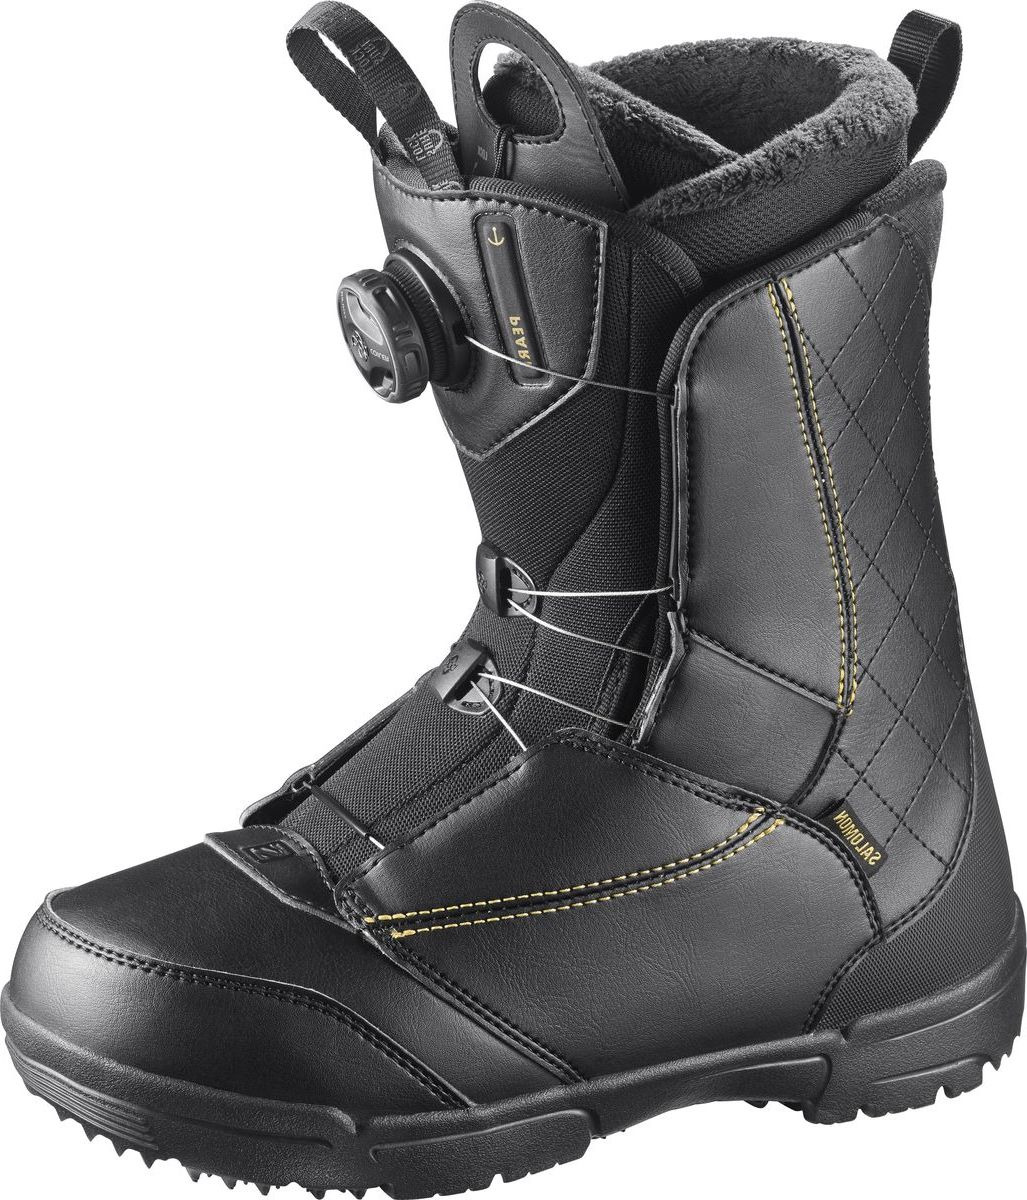 "Ботинки для сноуборда Salomon ""Pearl Boa"", цвет: черный, золотистый. Размер 25 (38)"